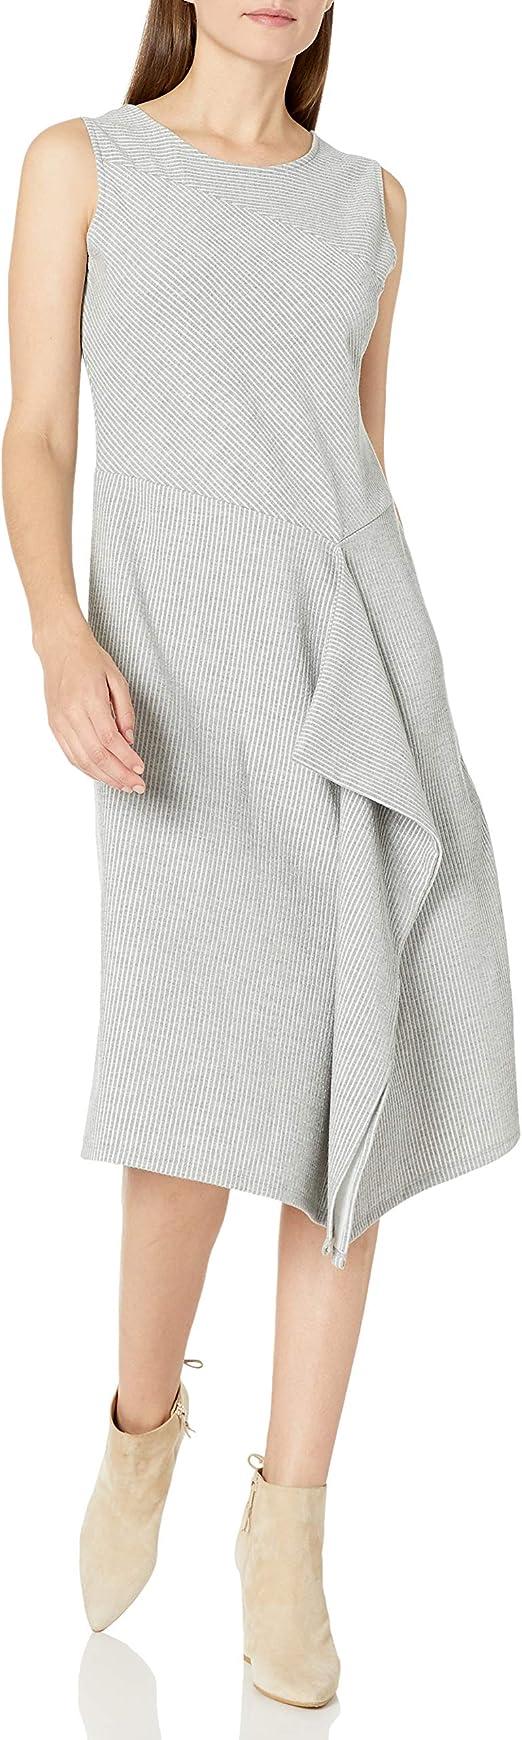 Calvin Klein 卡尔文克莱因 CK 无袖条纹 女式连衣裙 XS码2.1折$31.2 海淘转运到手约¥251